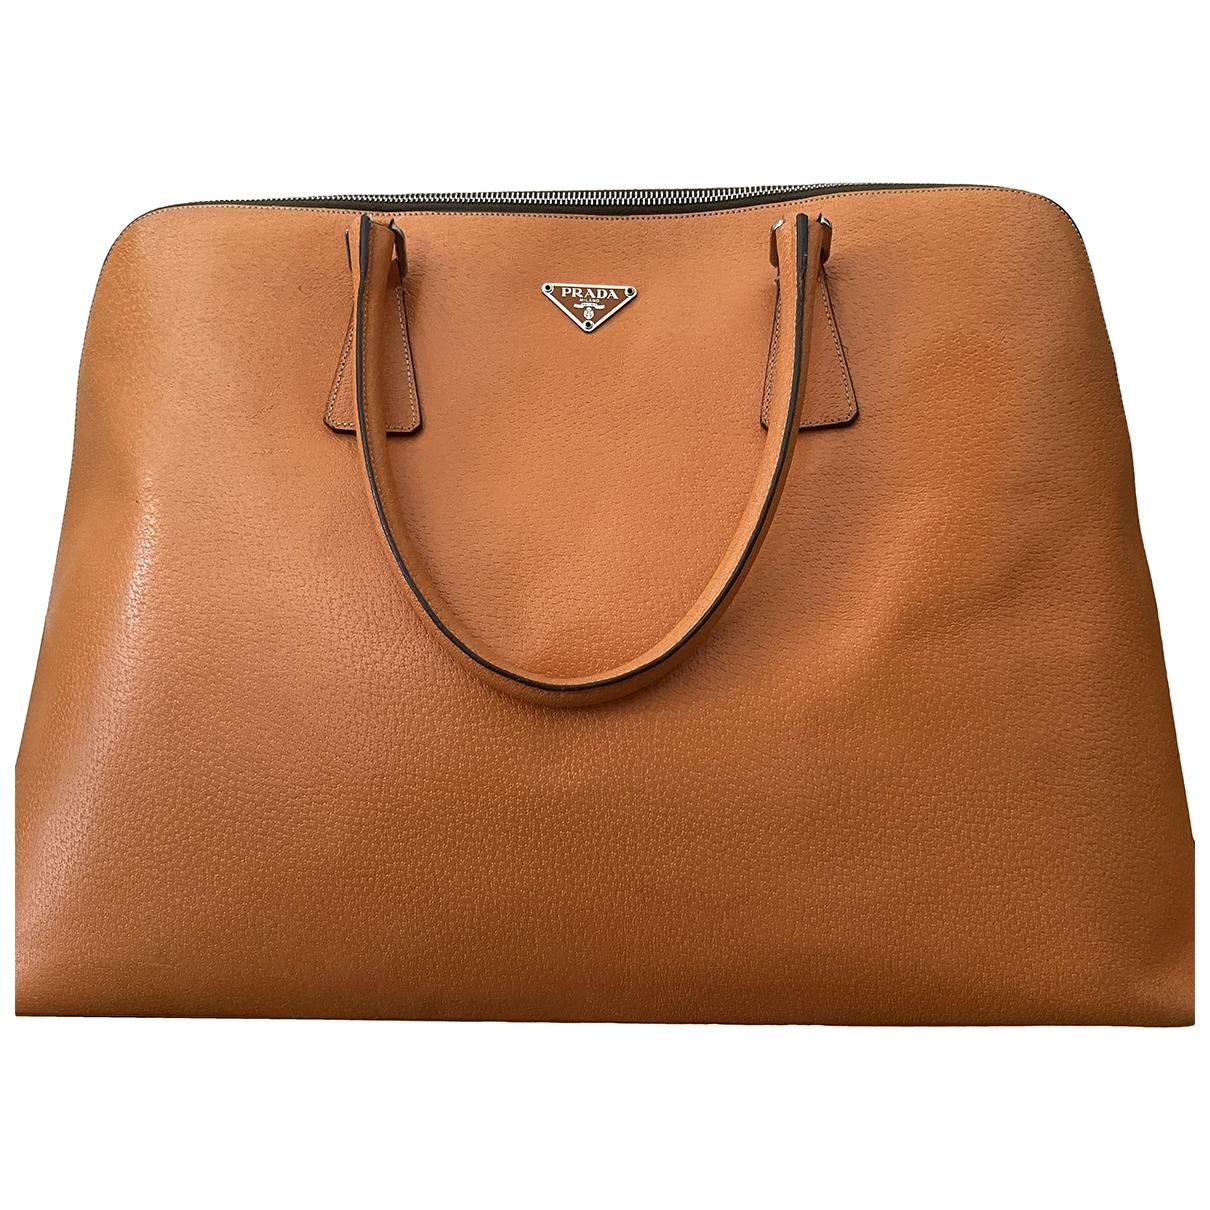 Prada \N Orange Leather handbag for Women \N